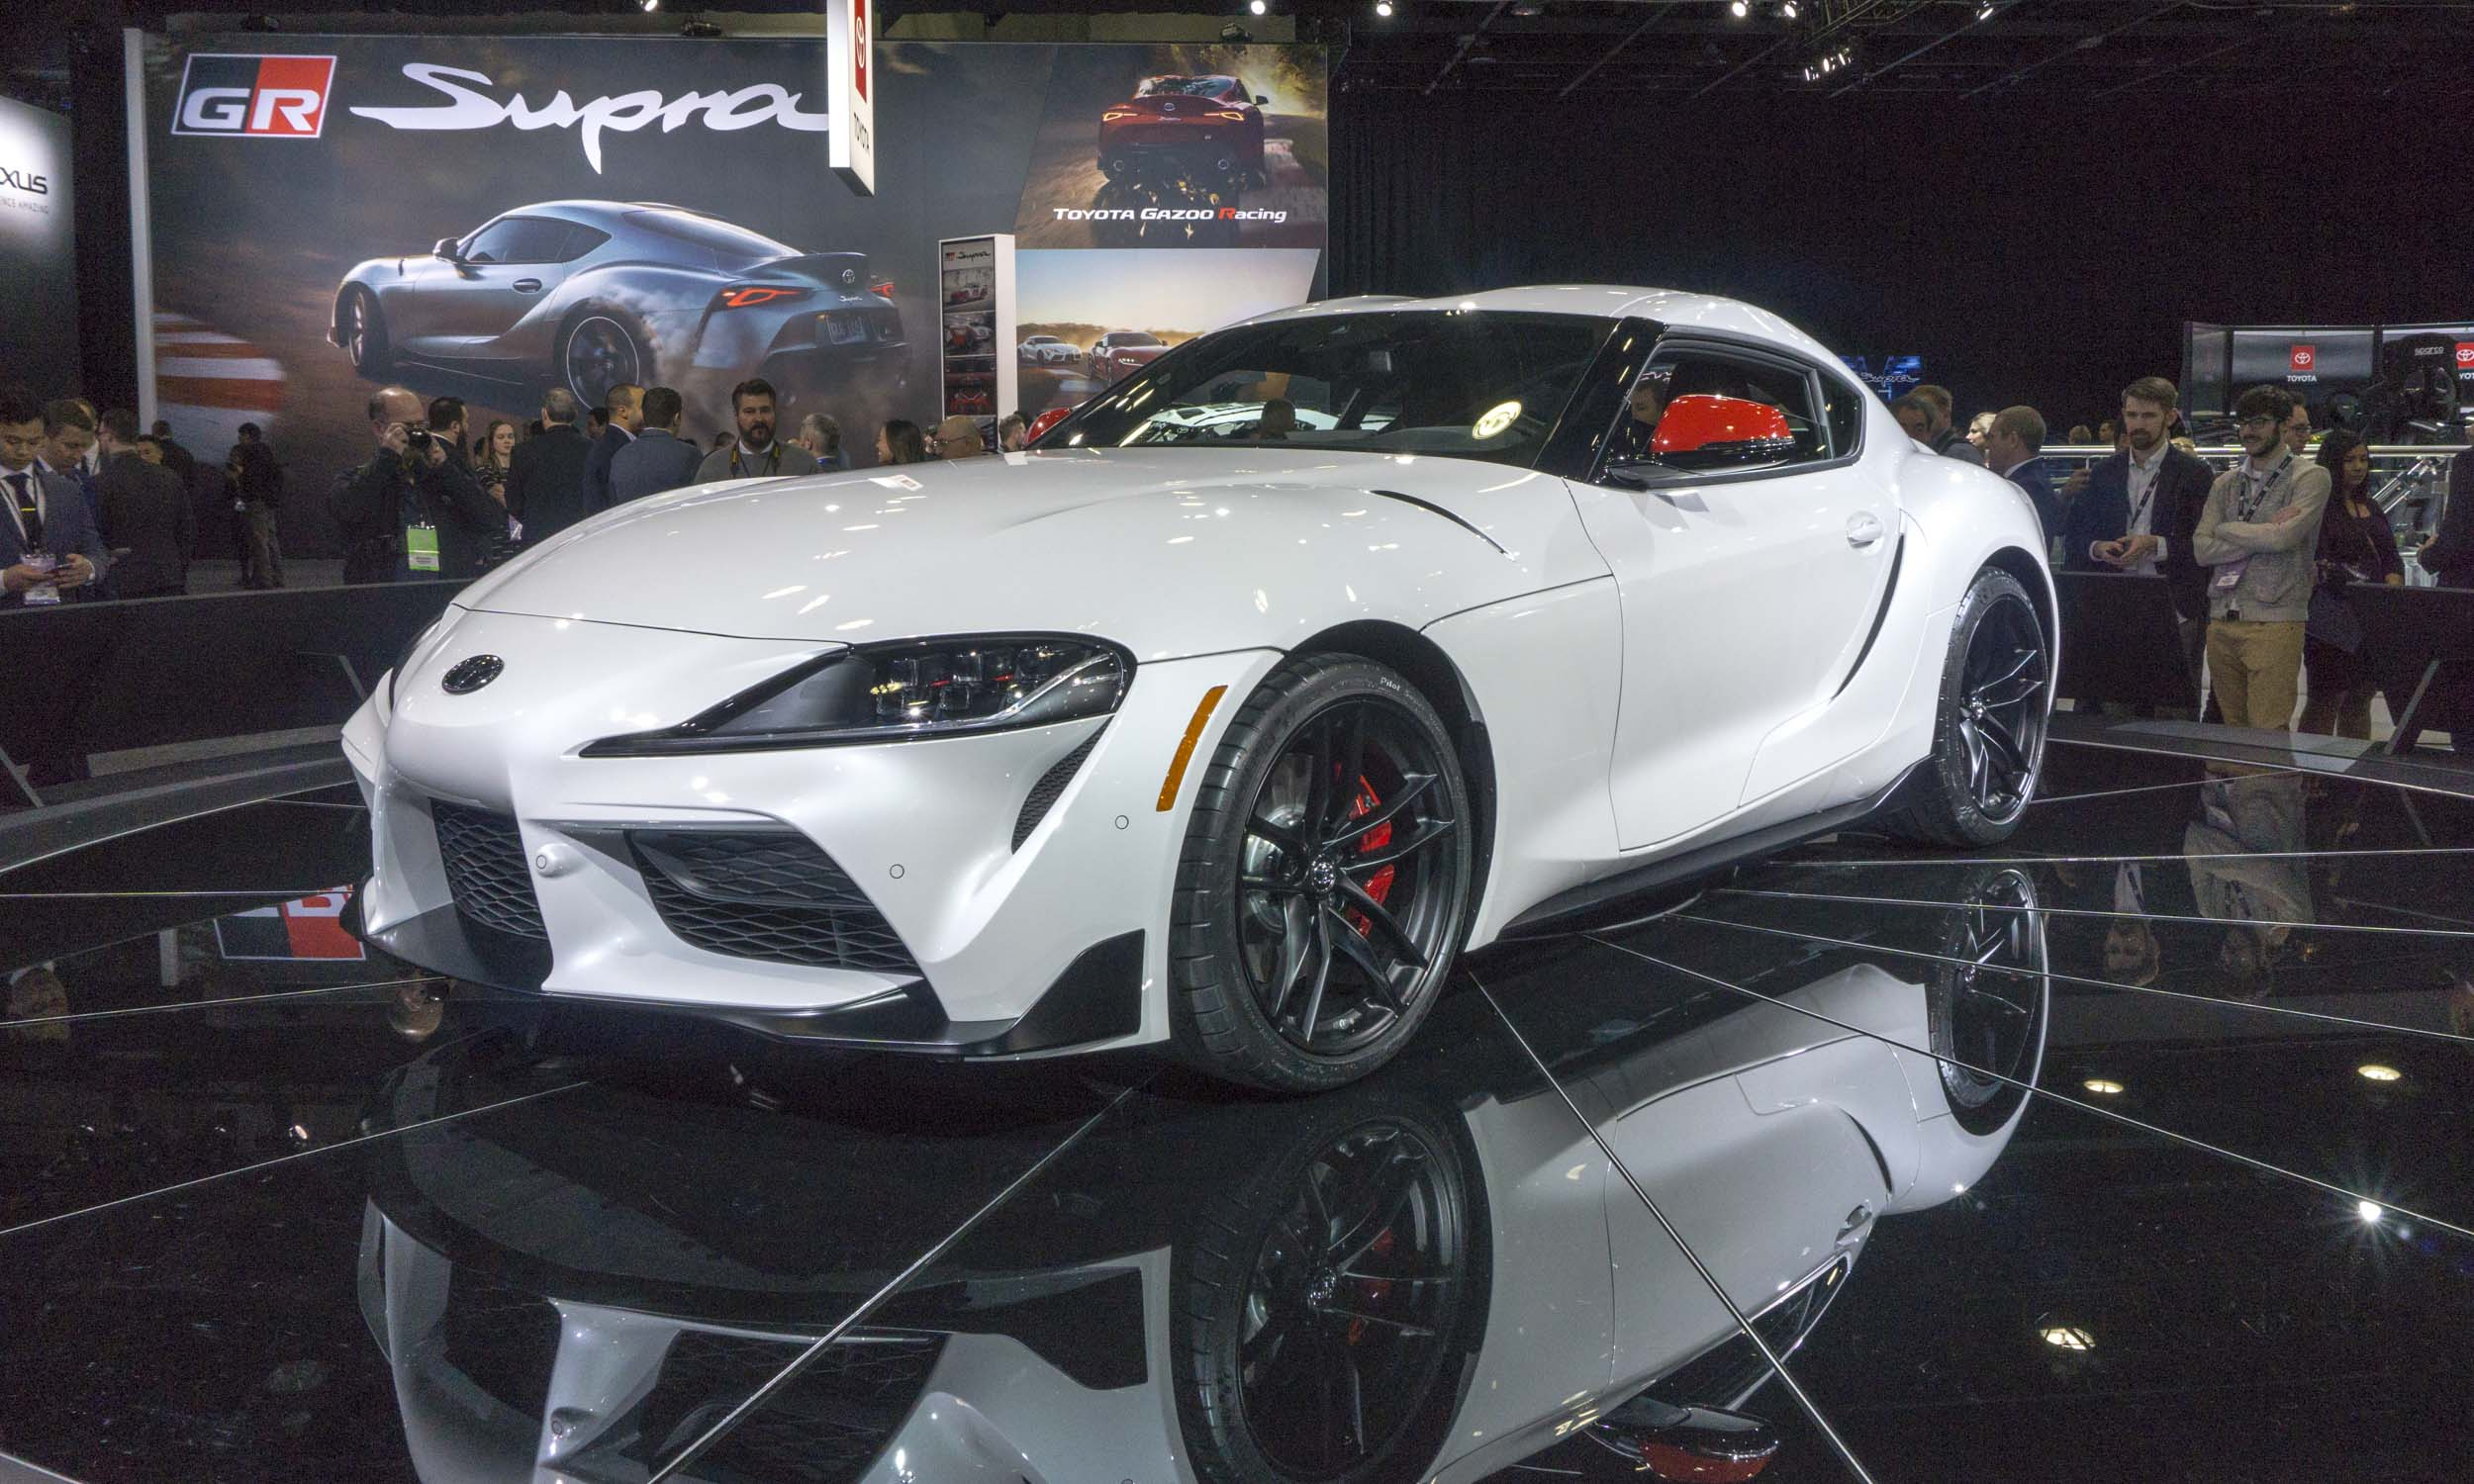 Luxury 2019 Vehicles: 2019 Detroit Auto Show: Luxury & Performance Cars